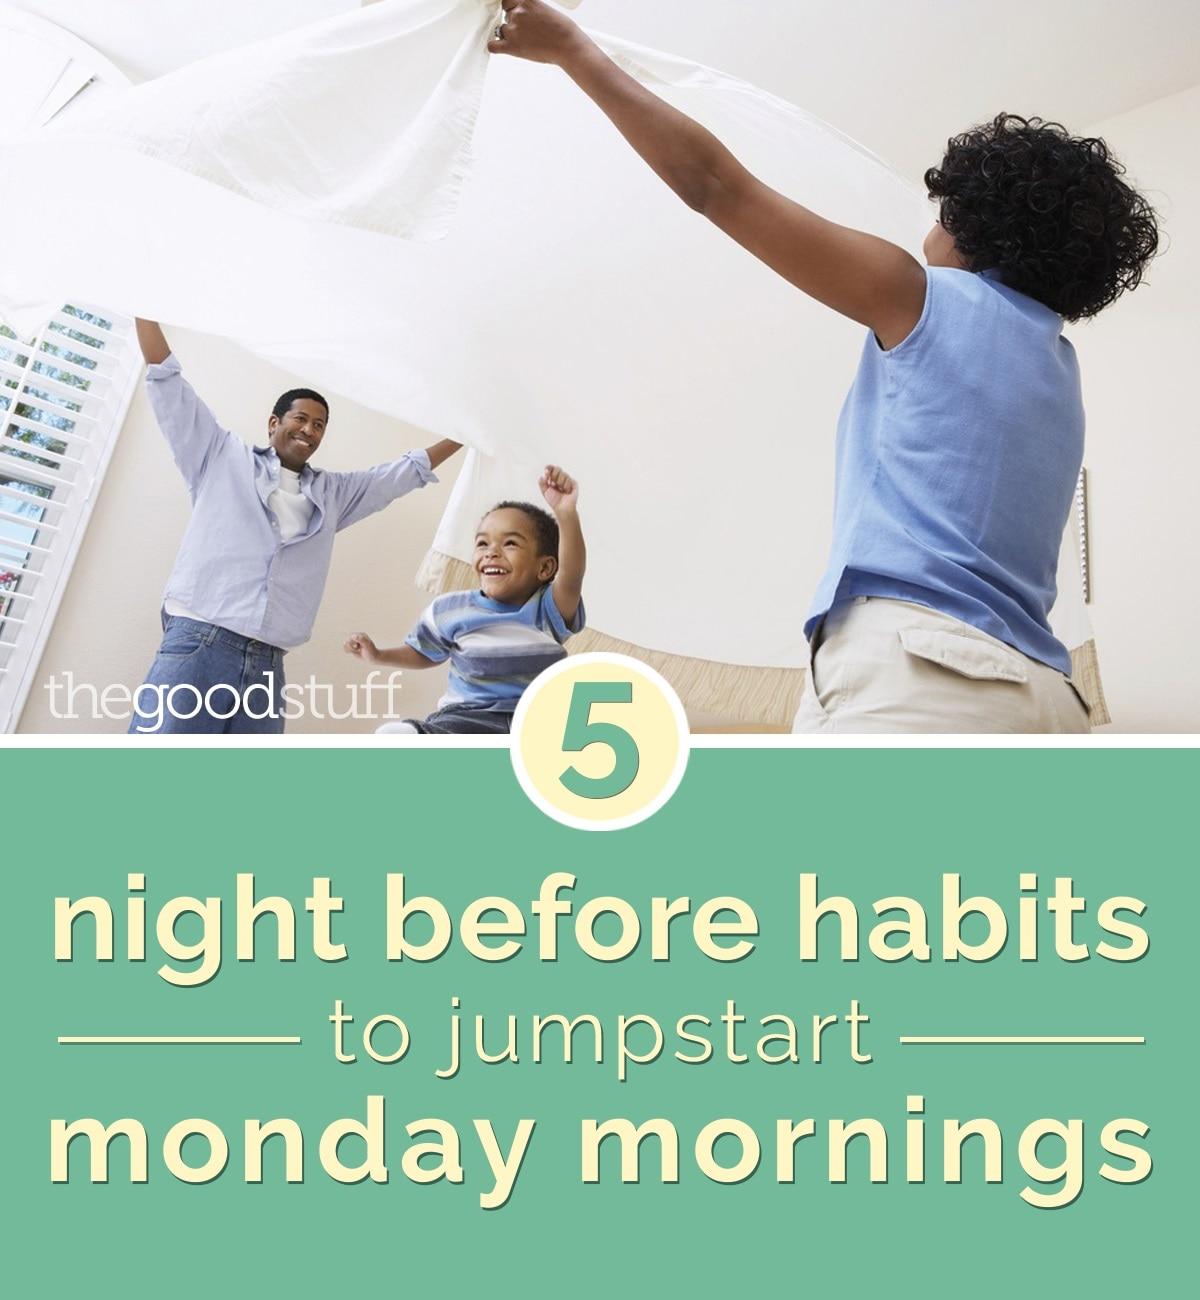 life-night-before-habits